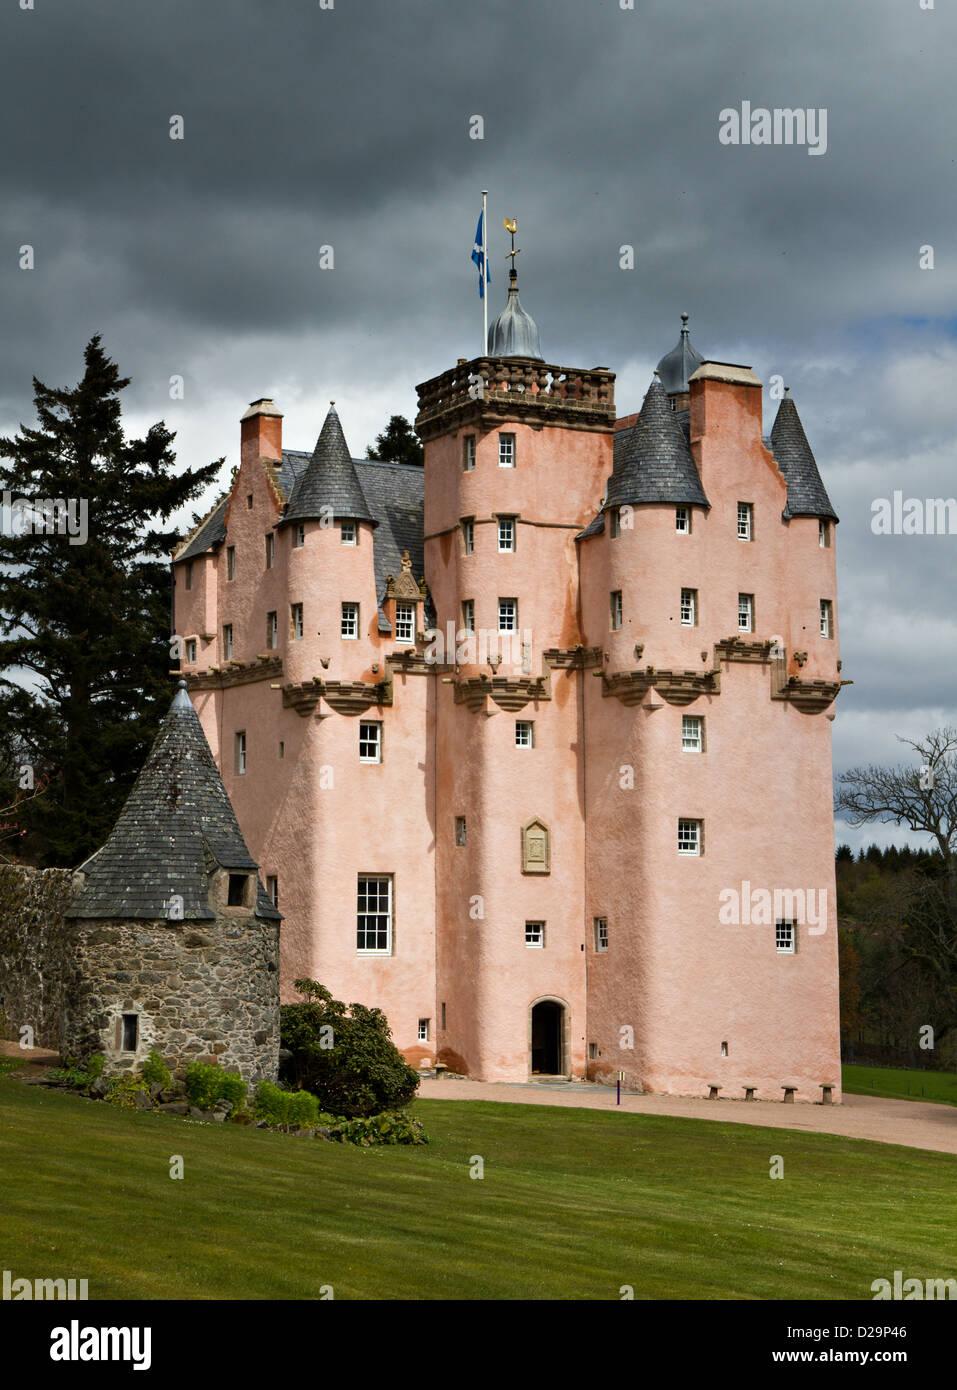 Baronial Craigievar Castle in Pink, Scotland, United Kingdom - Stock Image